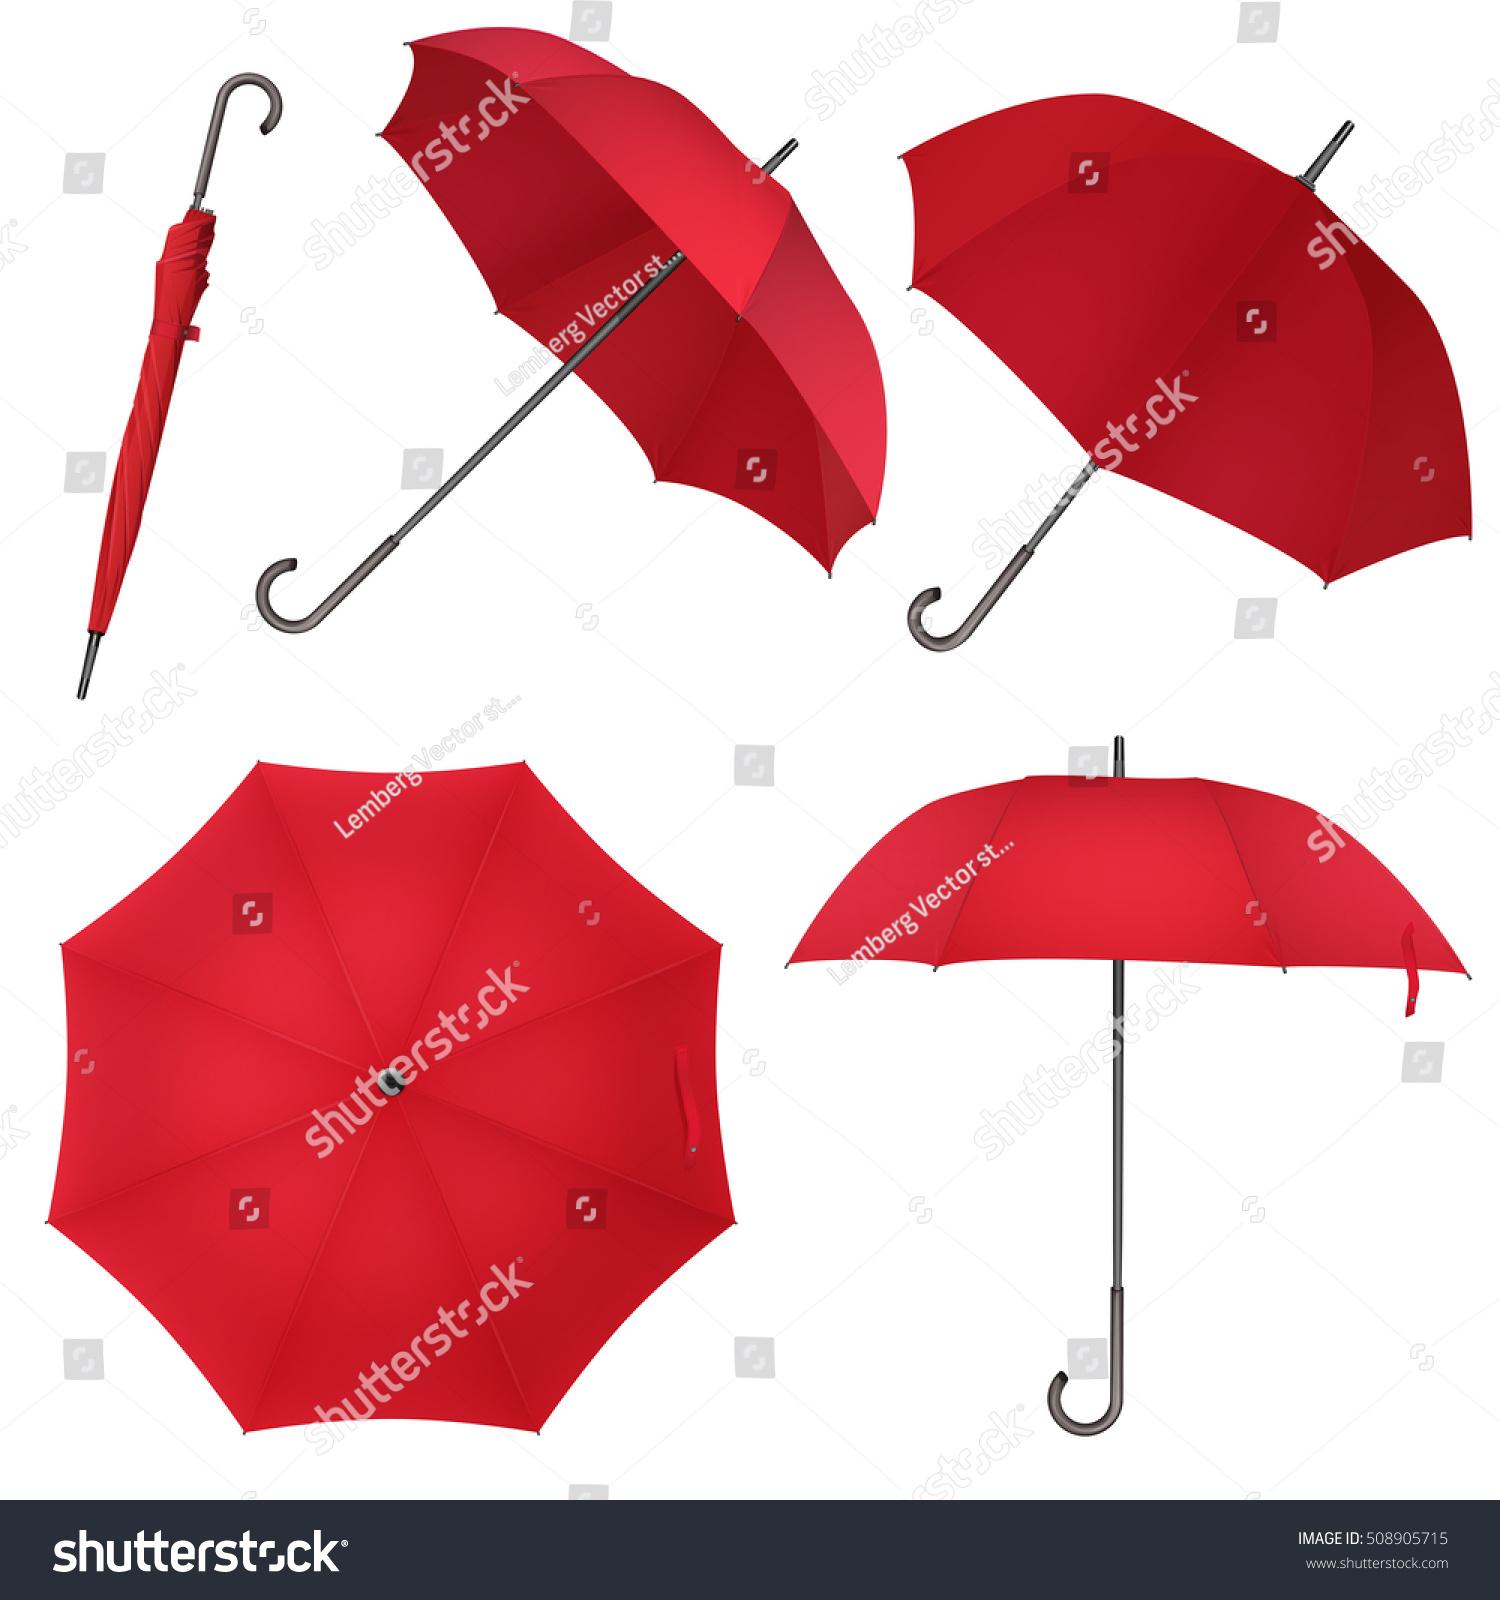 ab01bfb9f Red blank classic round rain Umbrella. Photo Realistic Umbrella vector  illustration